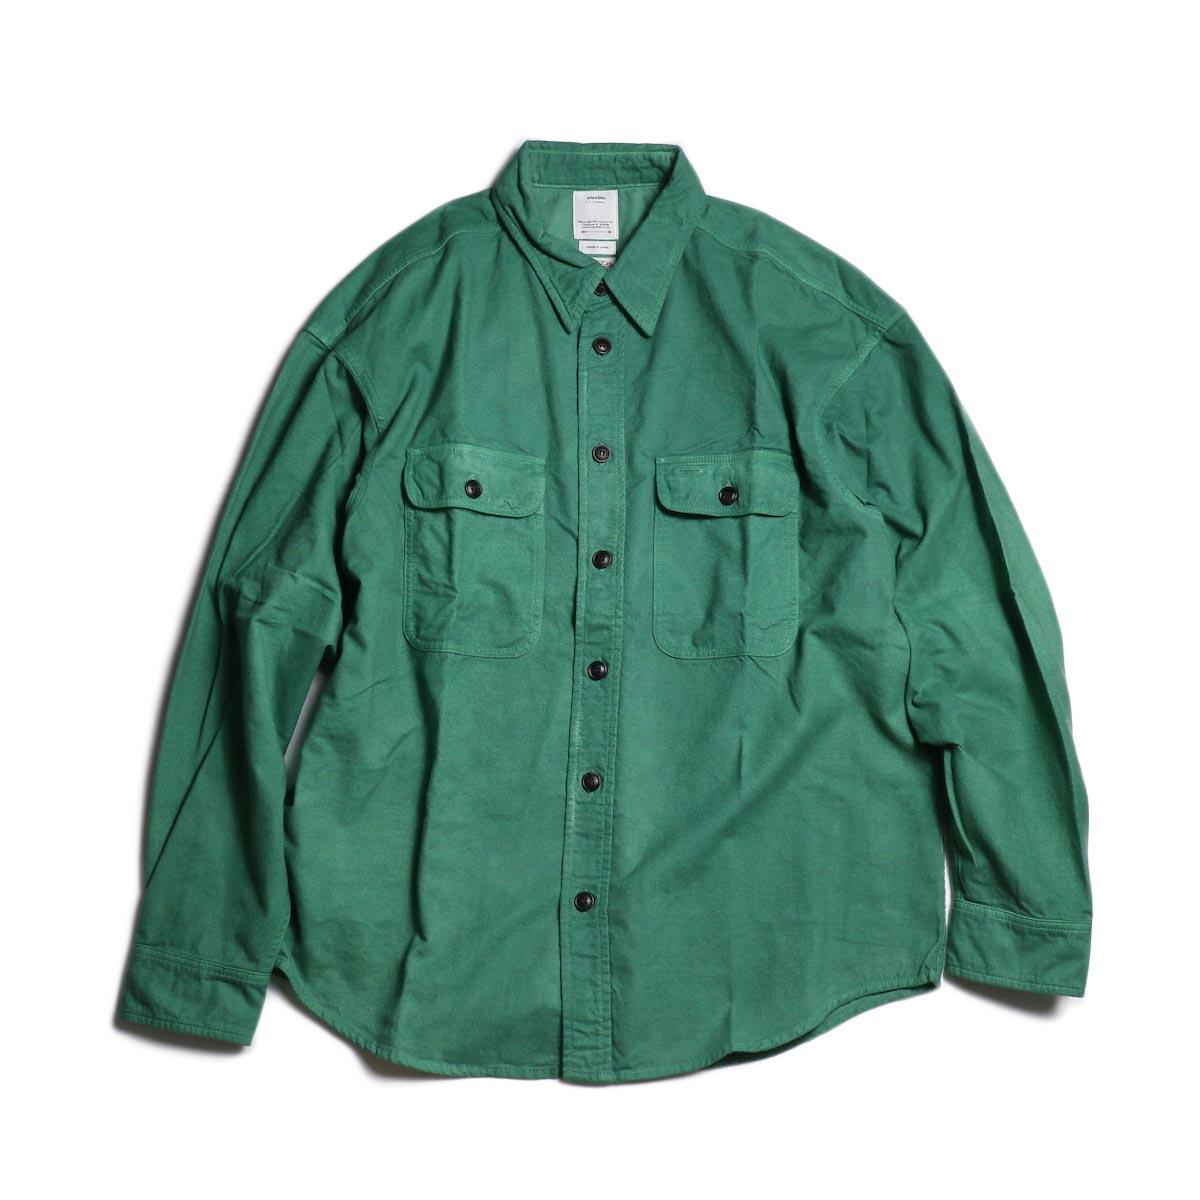 visvim / LUMBER SHIRT L/S (UNEVEN DYE) (Green)正面